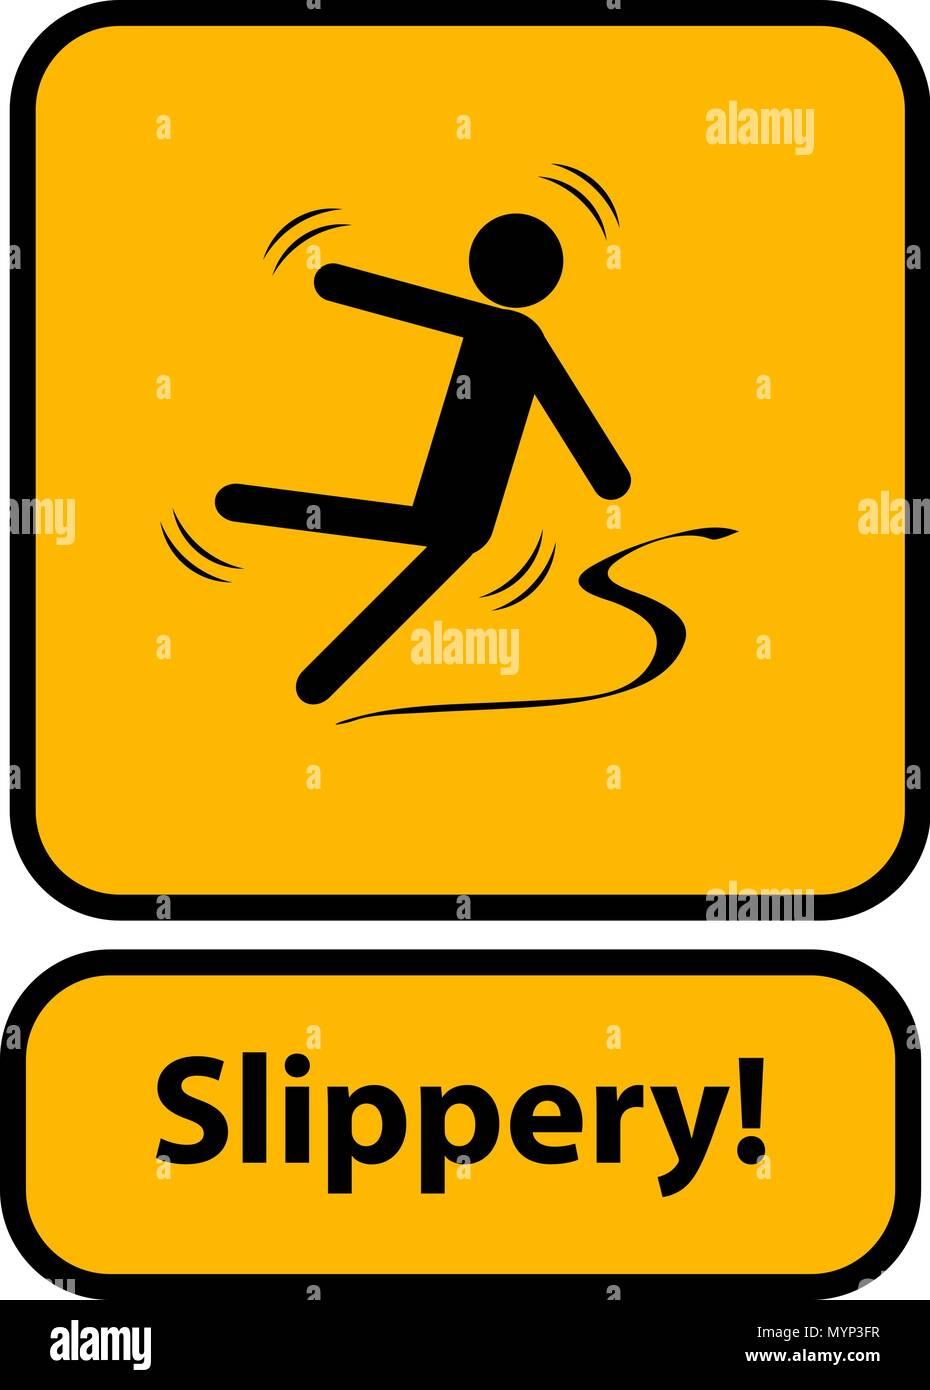 Slippery warning yellow sign - Stock Image